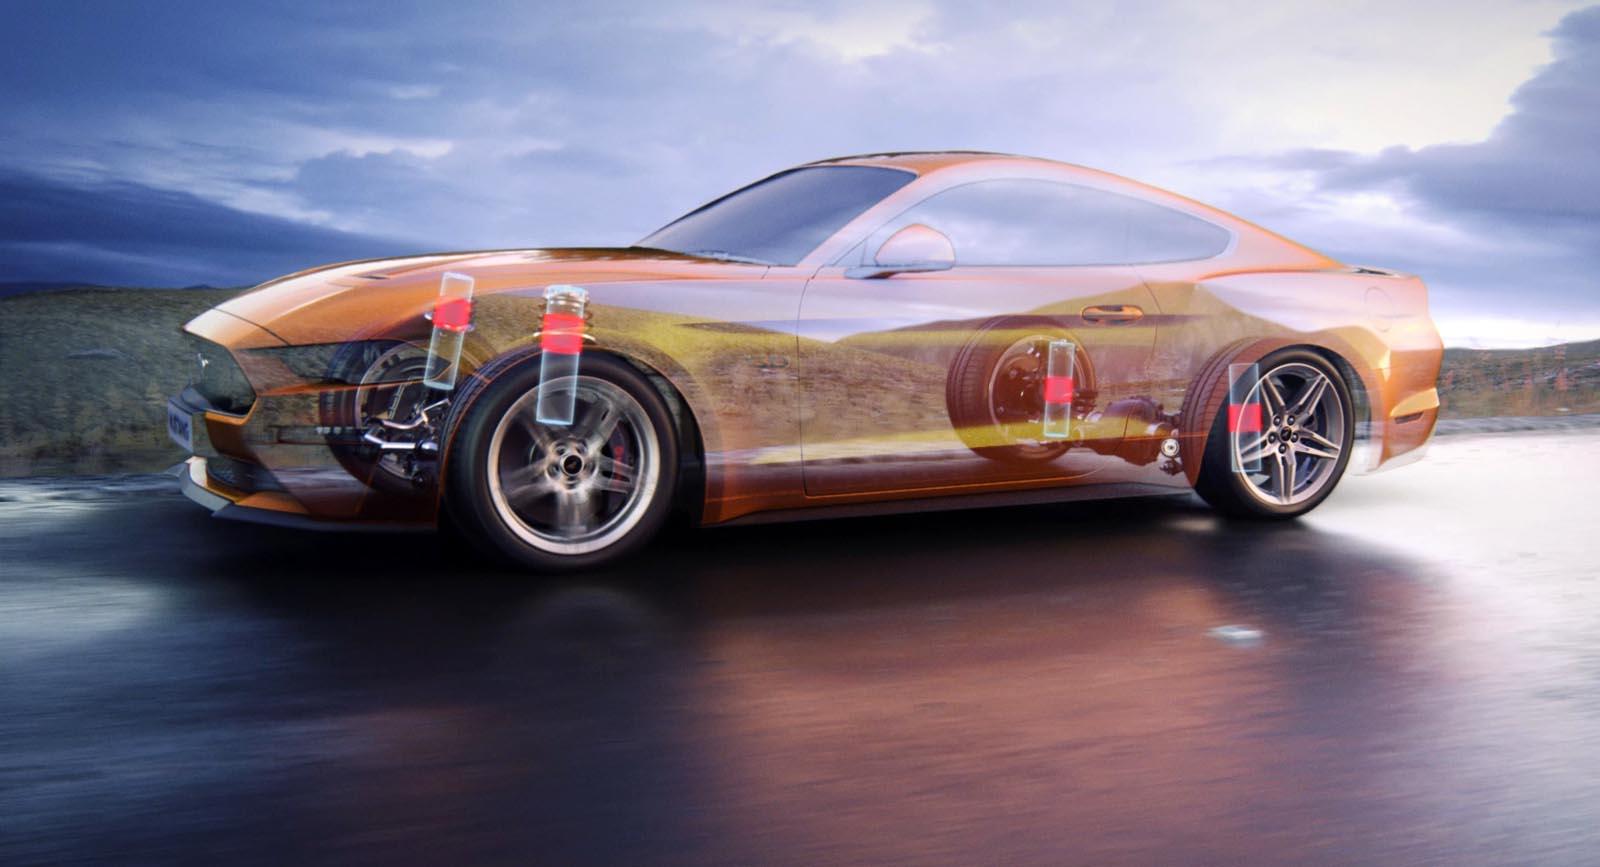 Photo of Πως λειτουργεί η ανάρτηση MagneRide στη νέα Mustang; [vid]